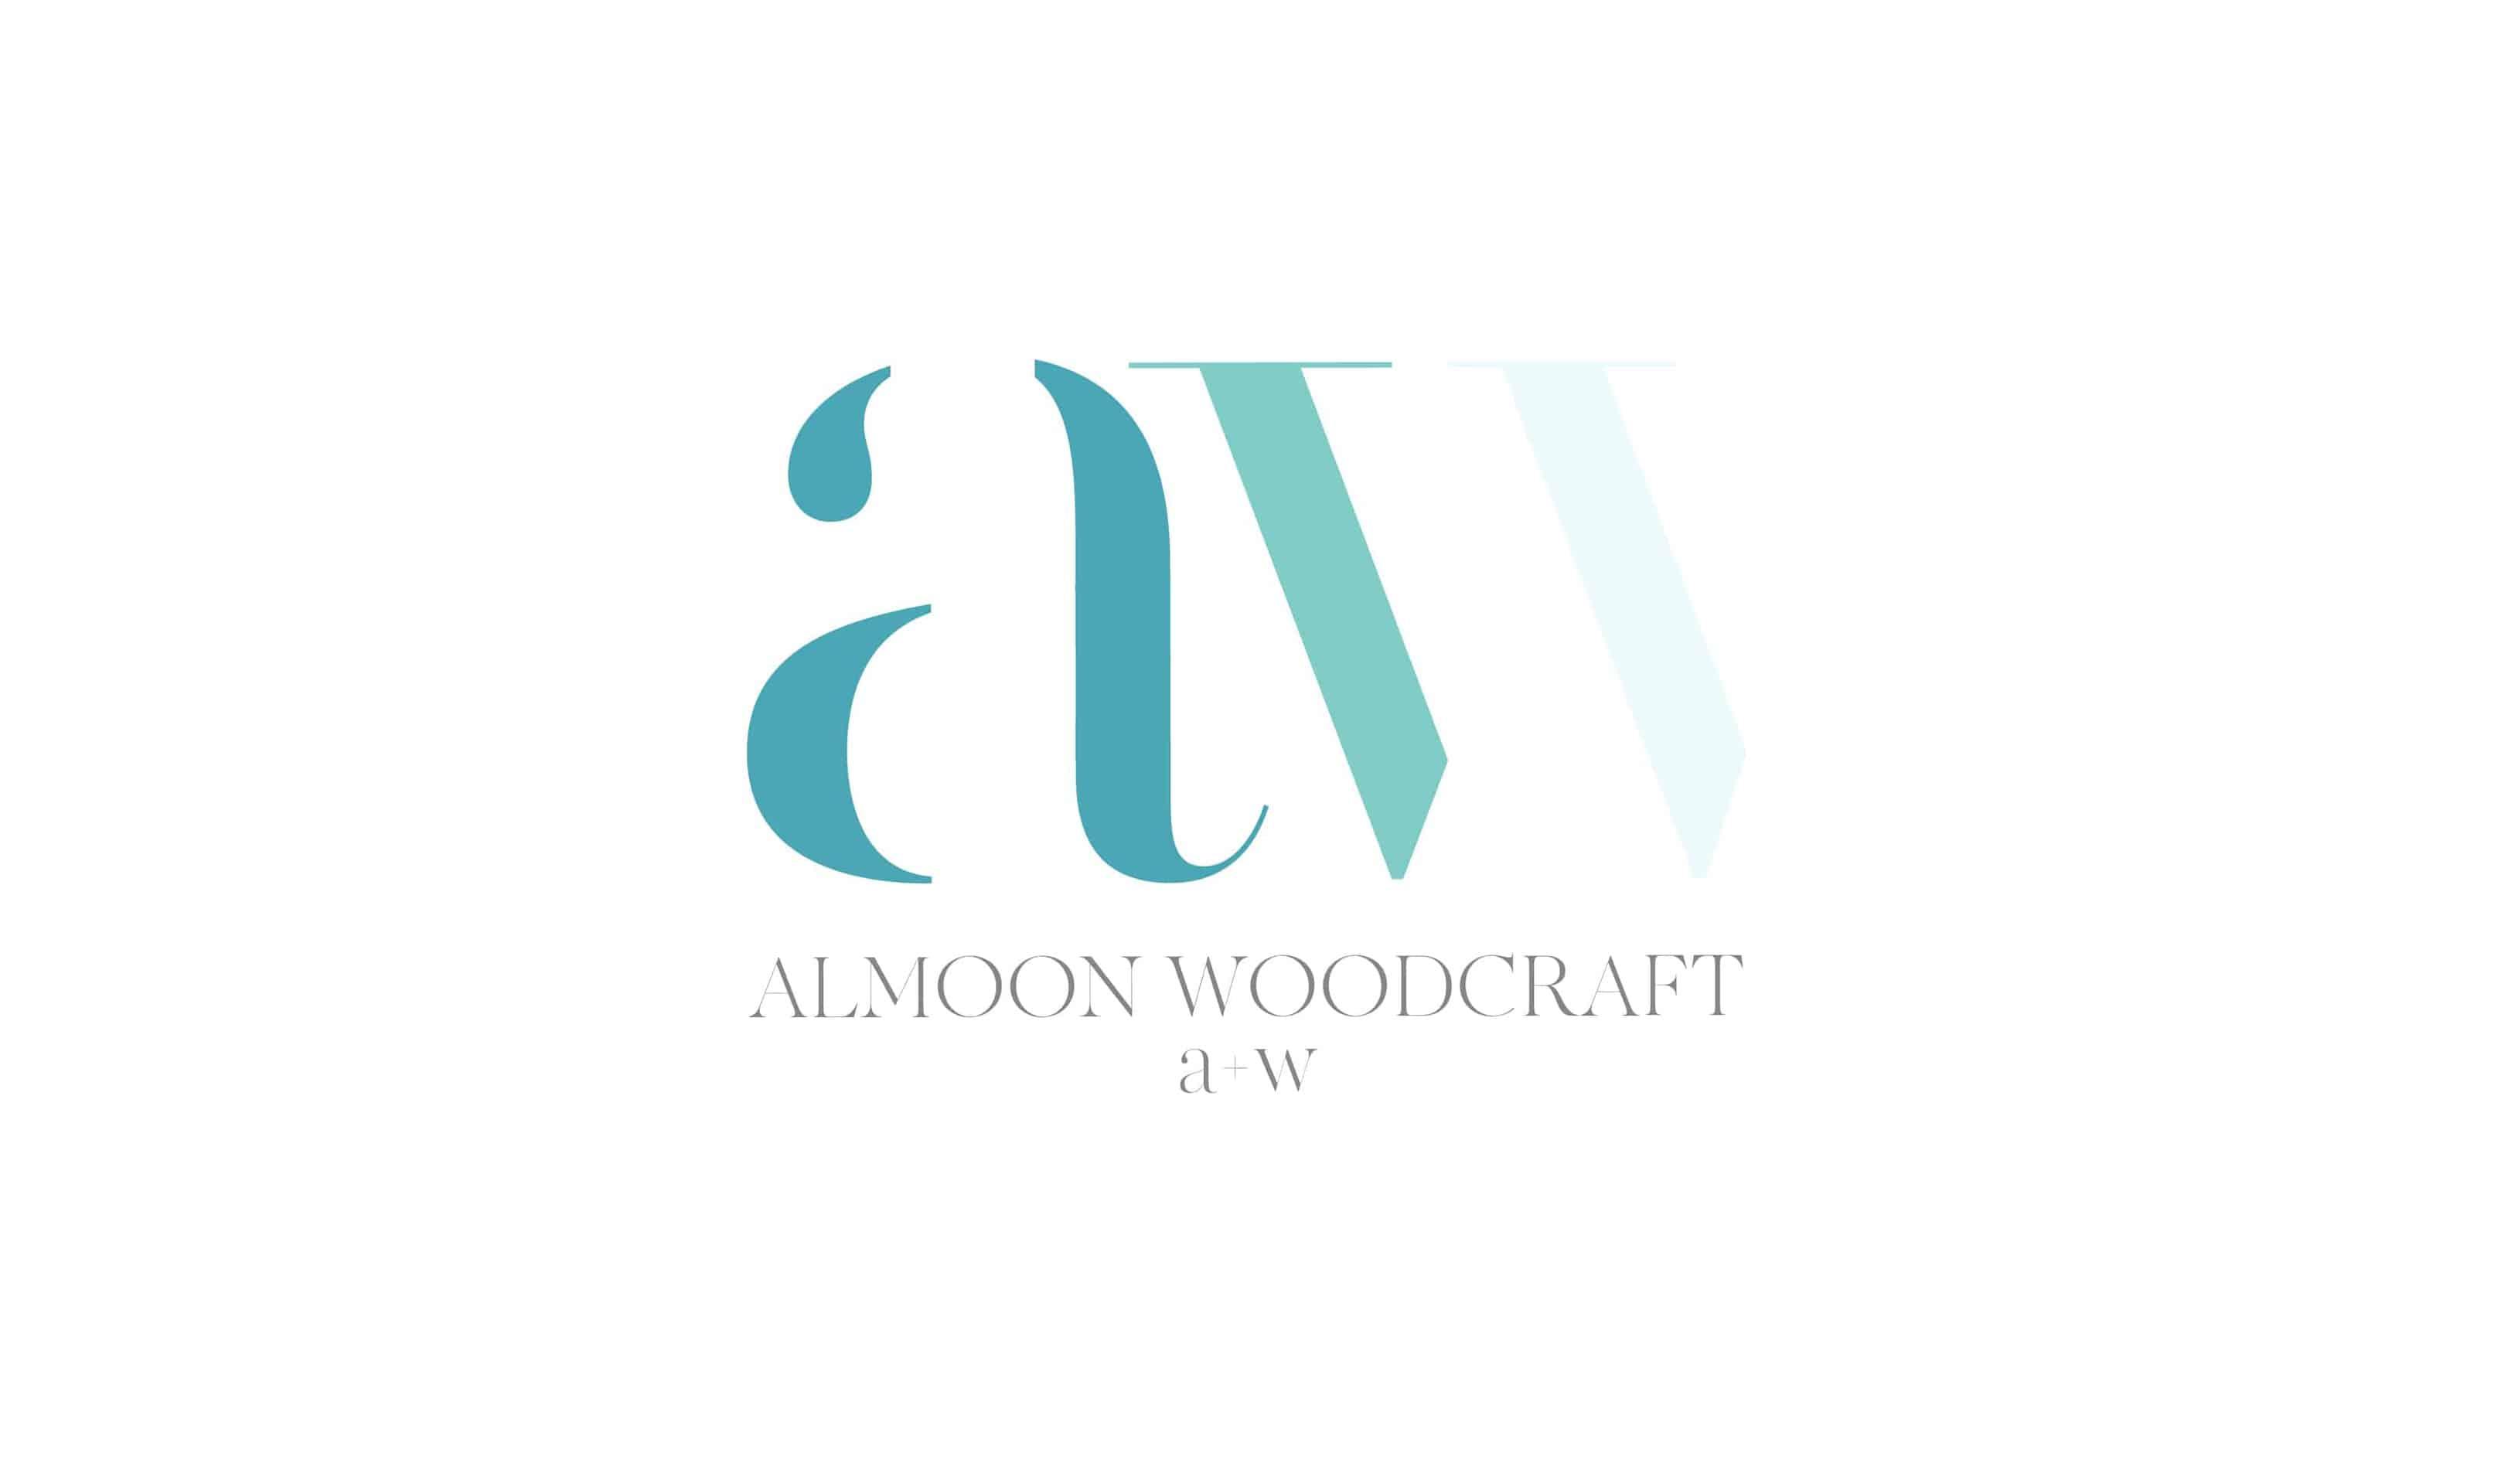 ALMOON WOODCRAFT (AW) BRANDING